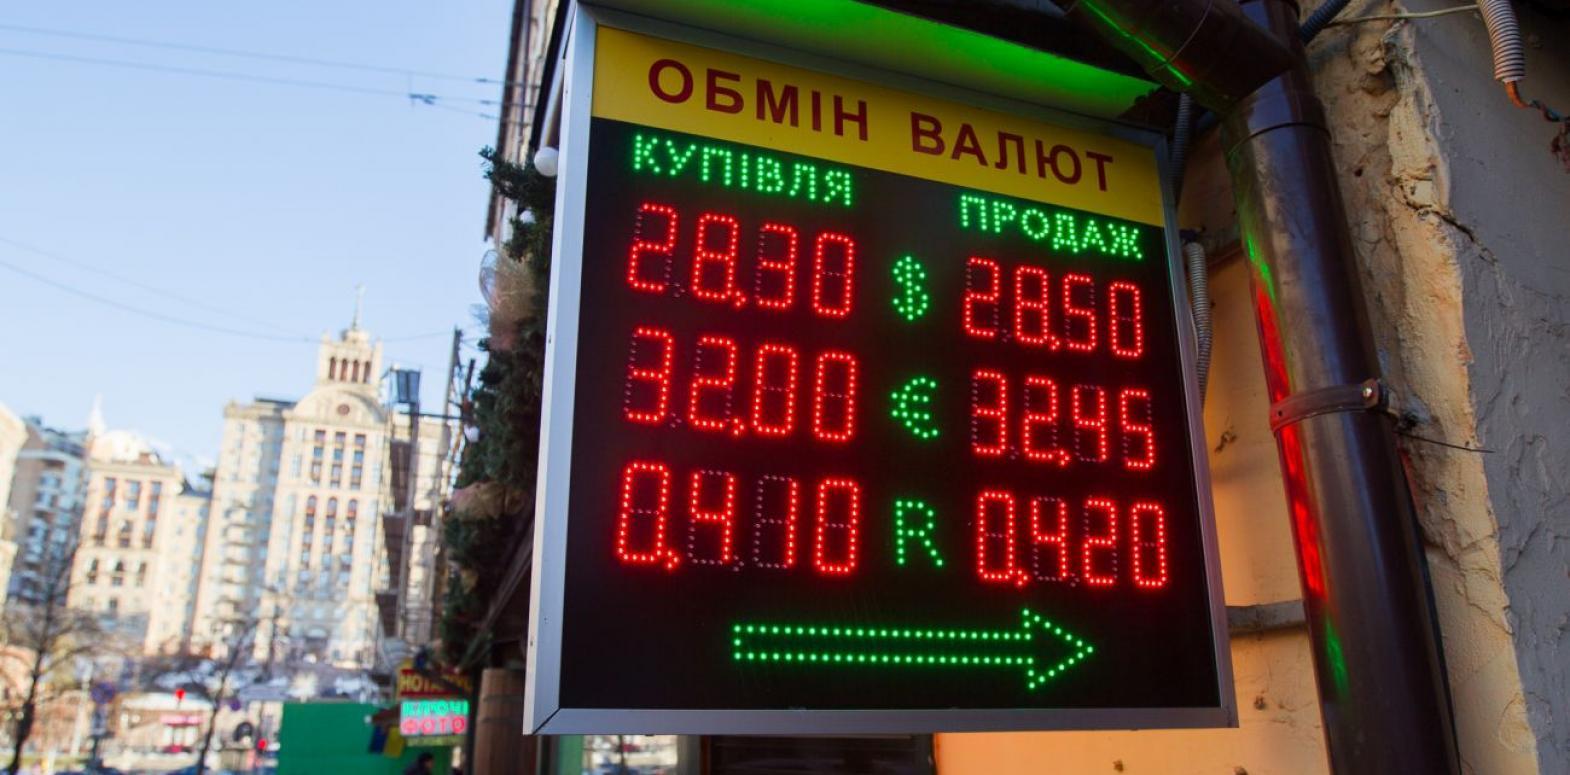 Аналитики допускают рост курса доллара до 28 гривен из-за отставки Смолия